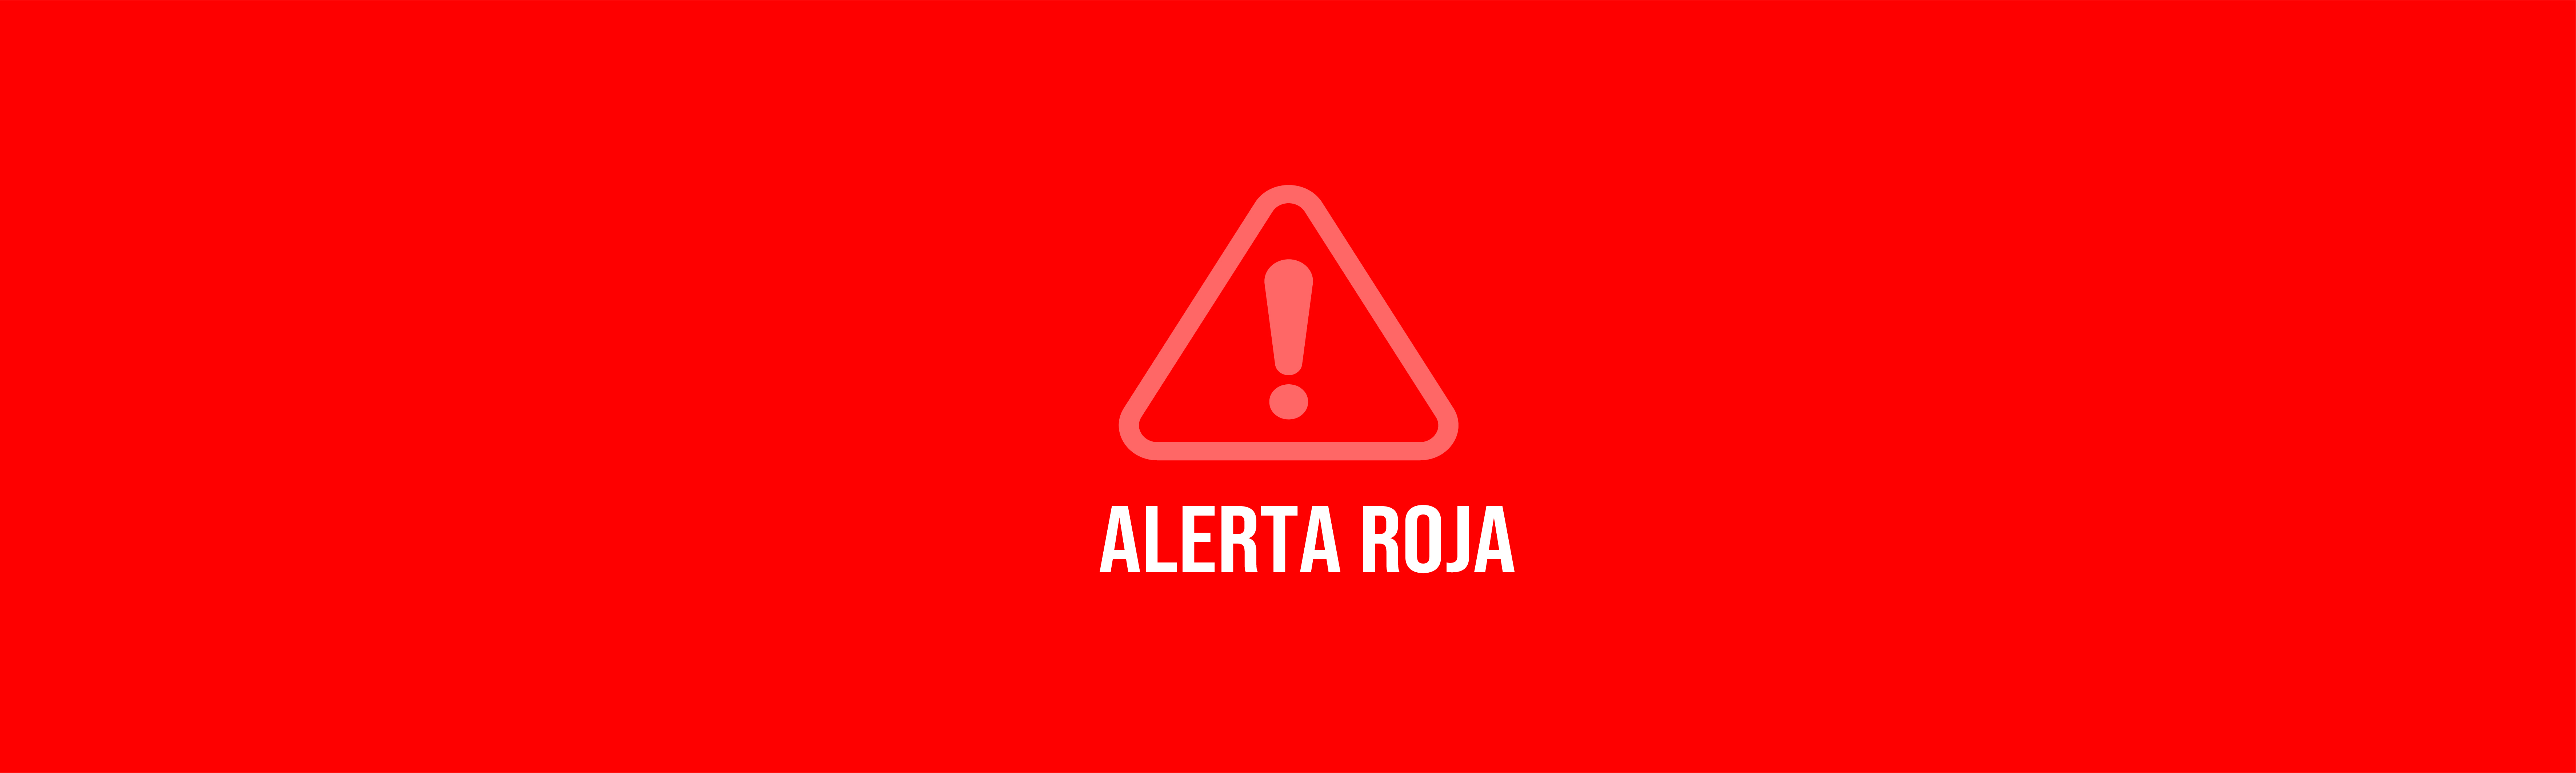 Alerta Roja por incendio                02/AGOSTO/2020